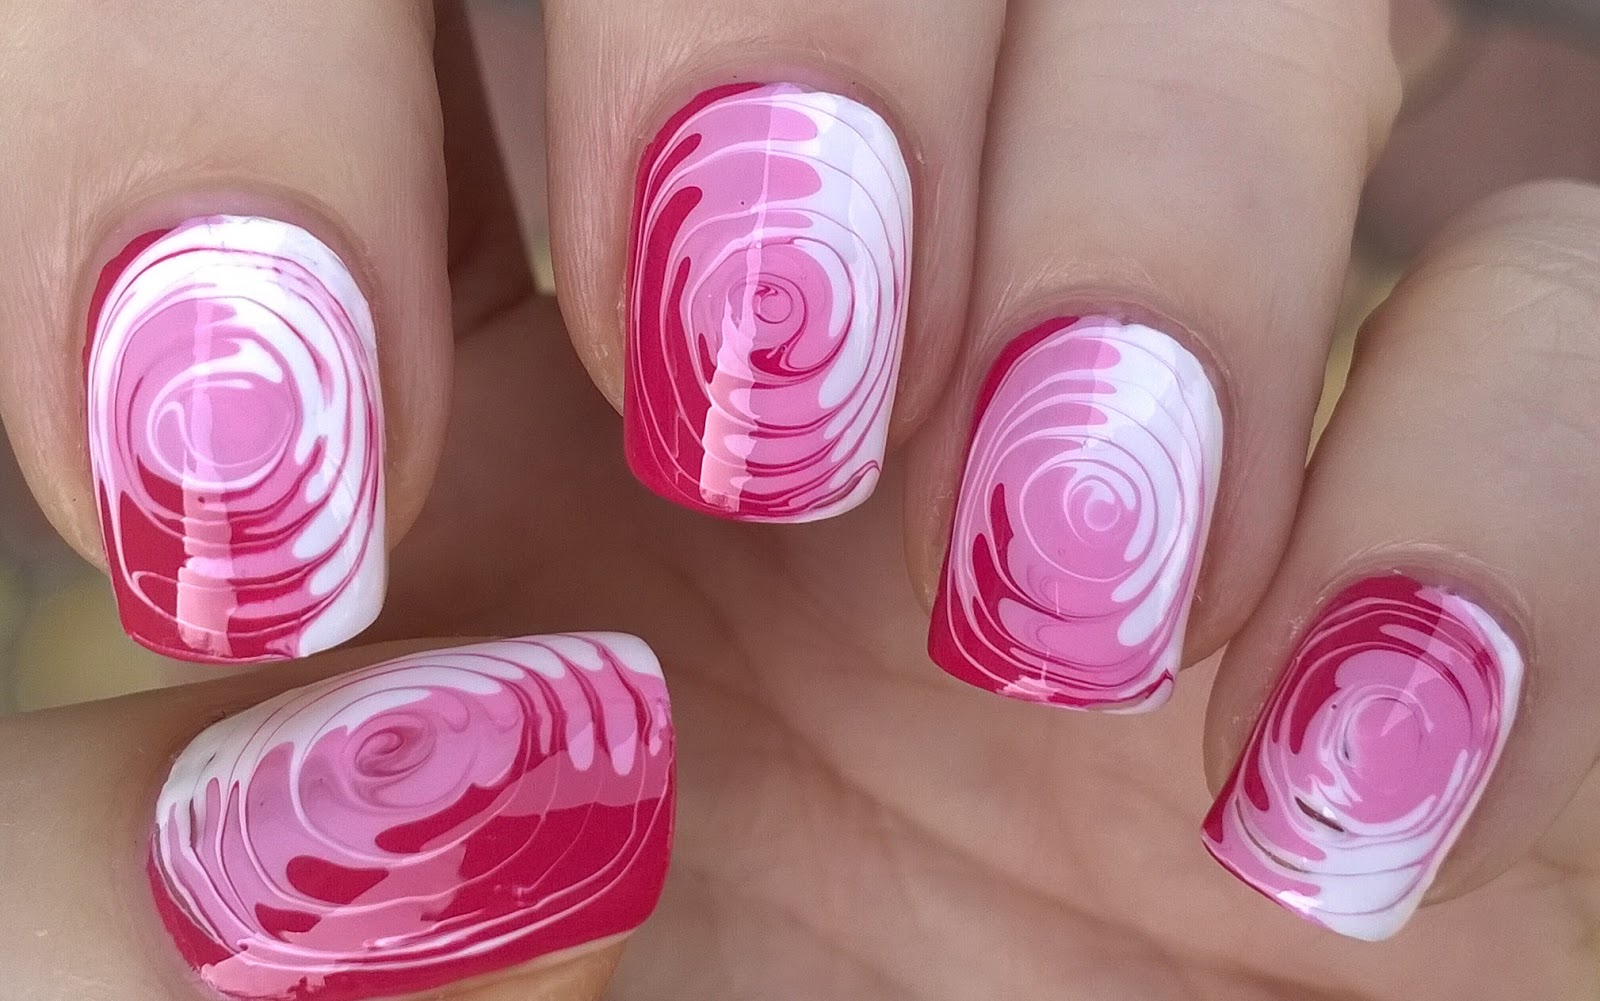 Life world women tricolor swirl nail art pink toothpick nail idea tricolor swirl nail art pink toothpick nail idea prinsesfo Gallery